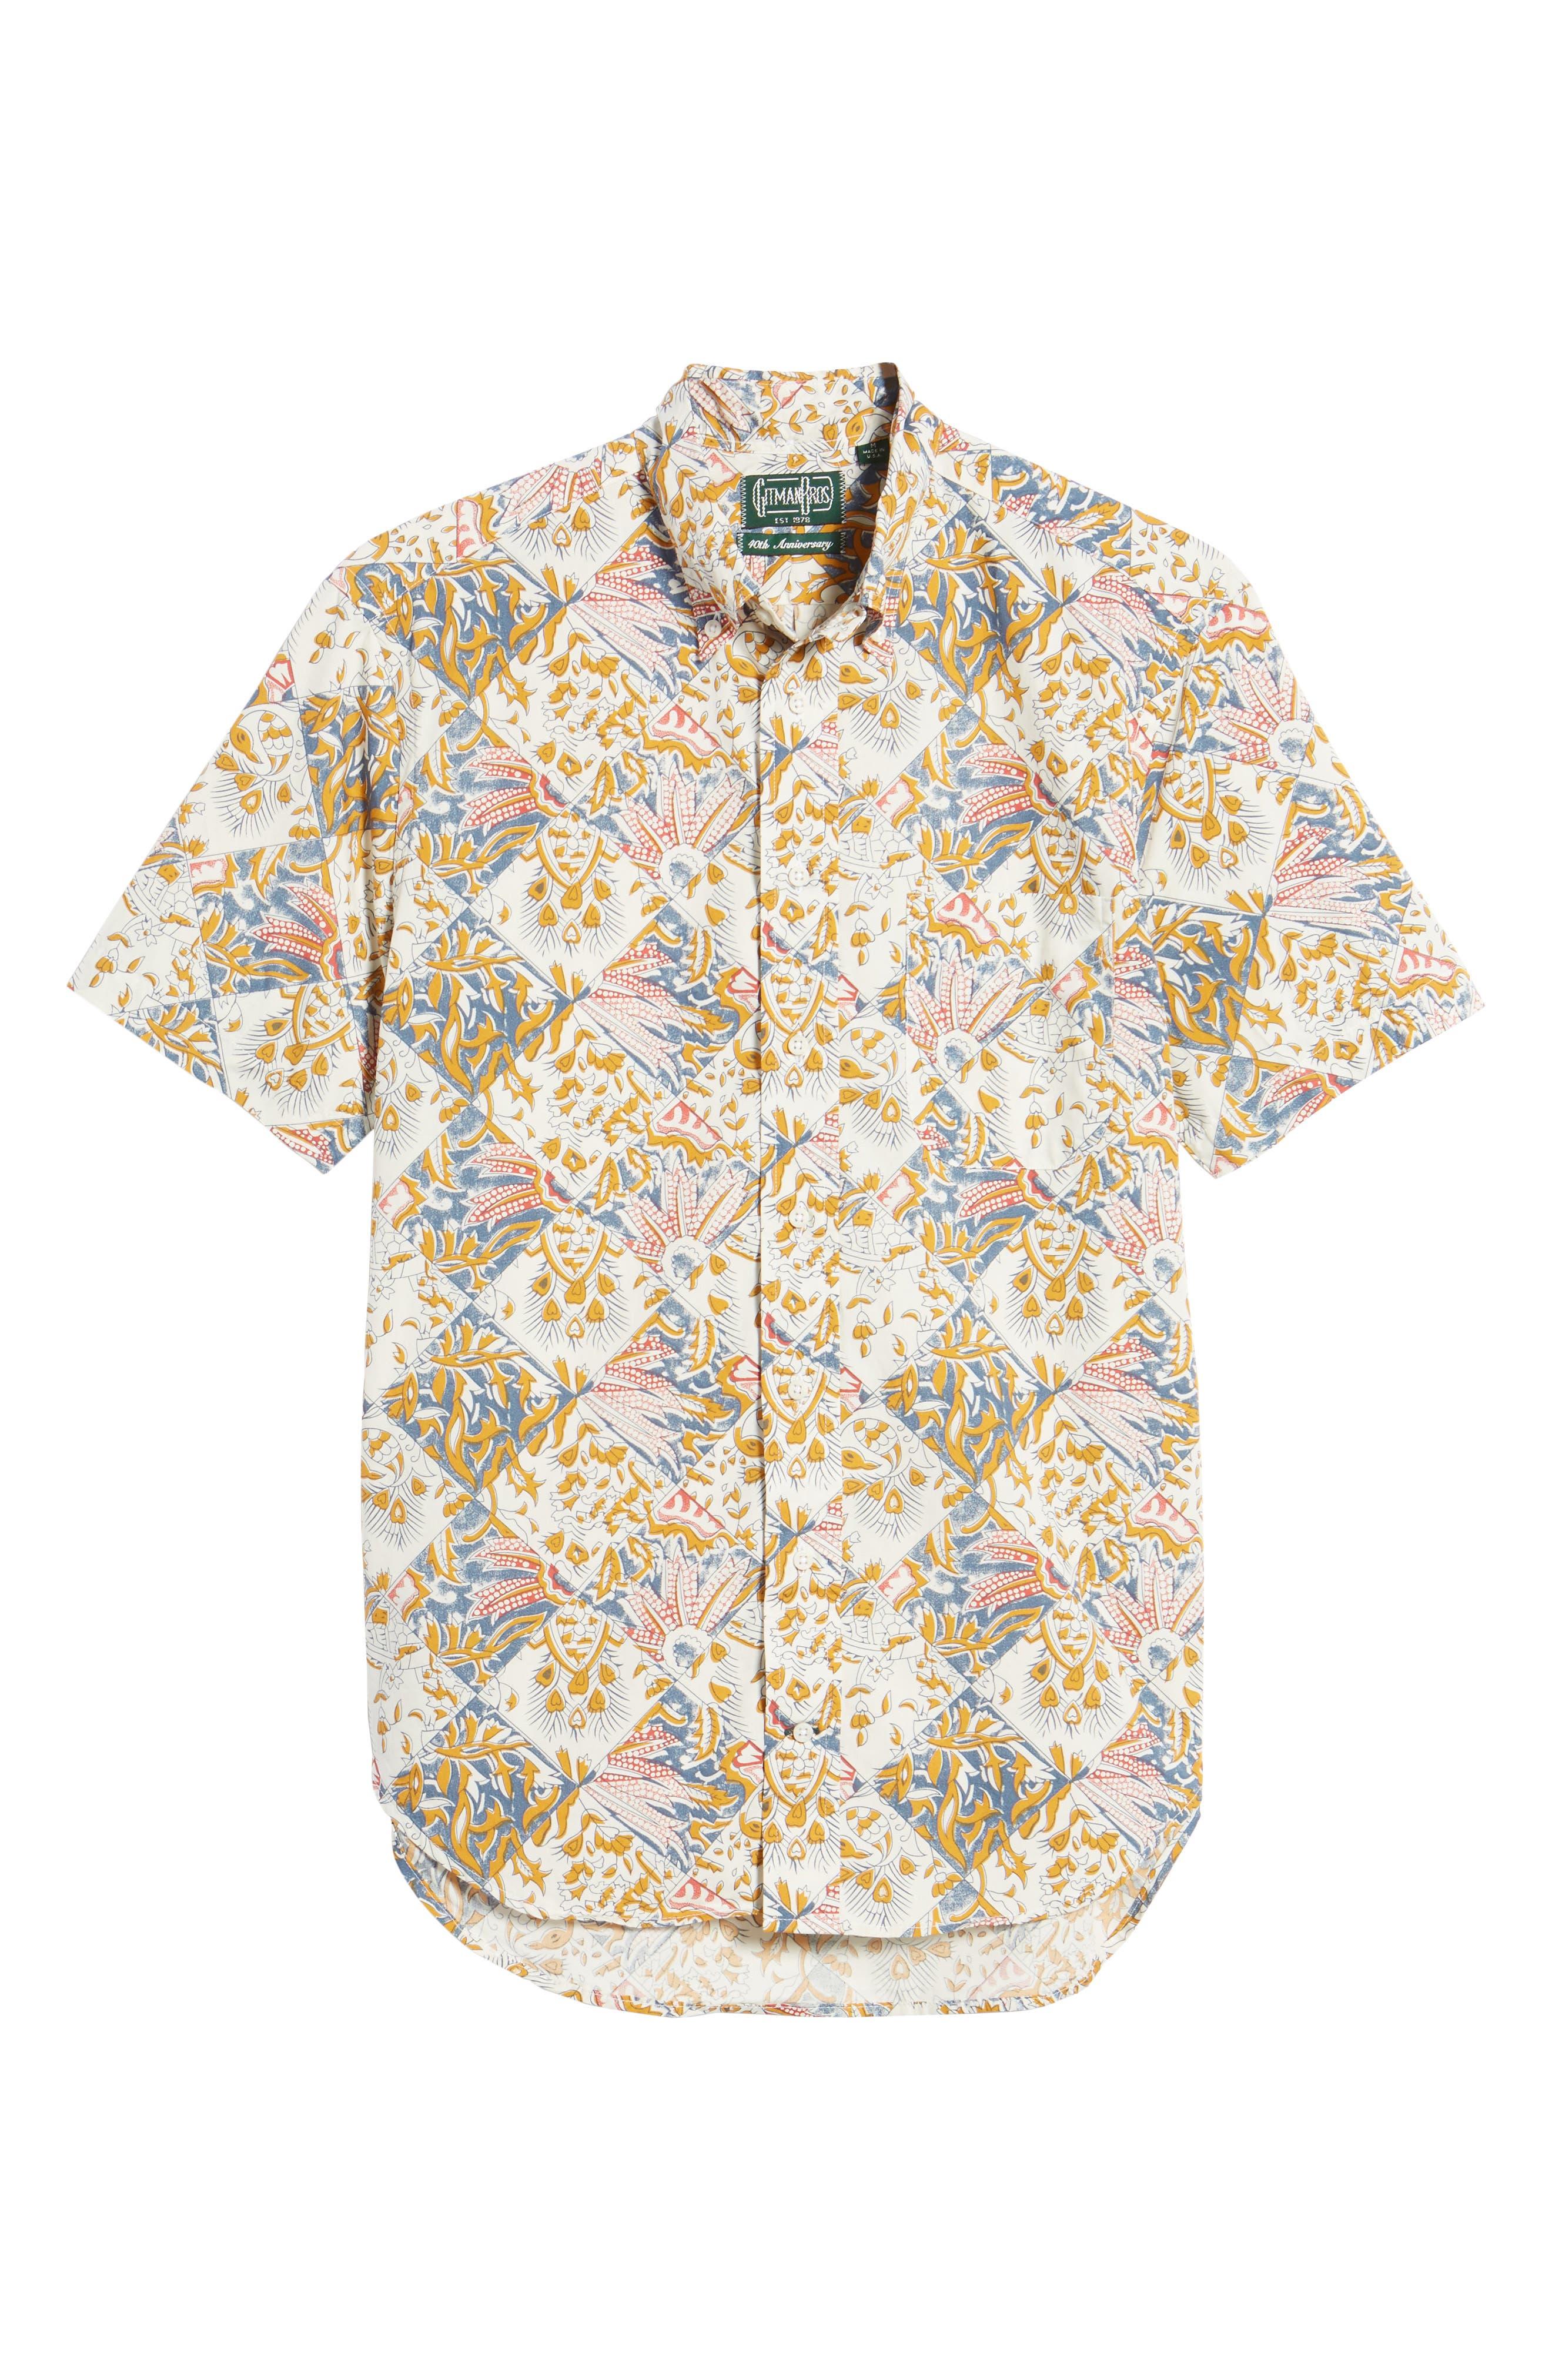 Camp Shirt,                             Alternate thumbnail 6, color,                             Multi